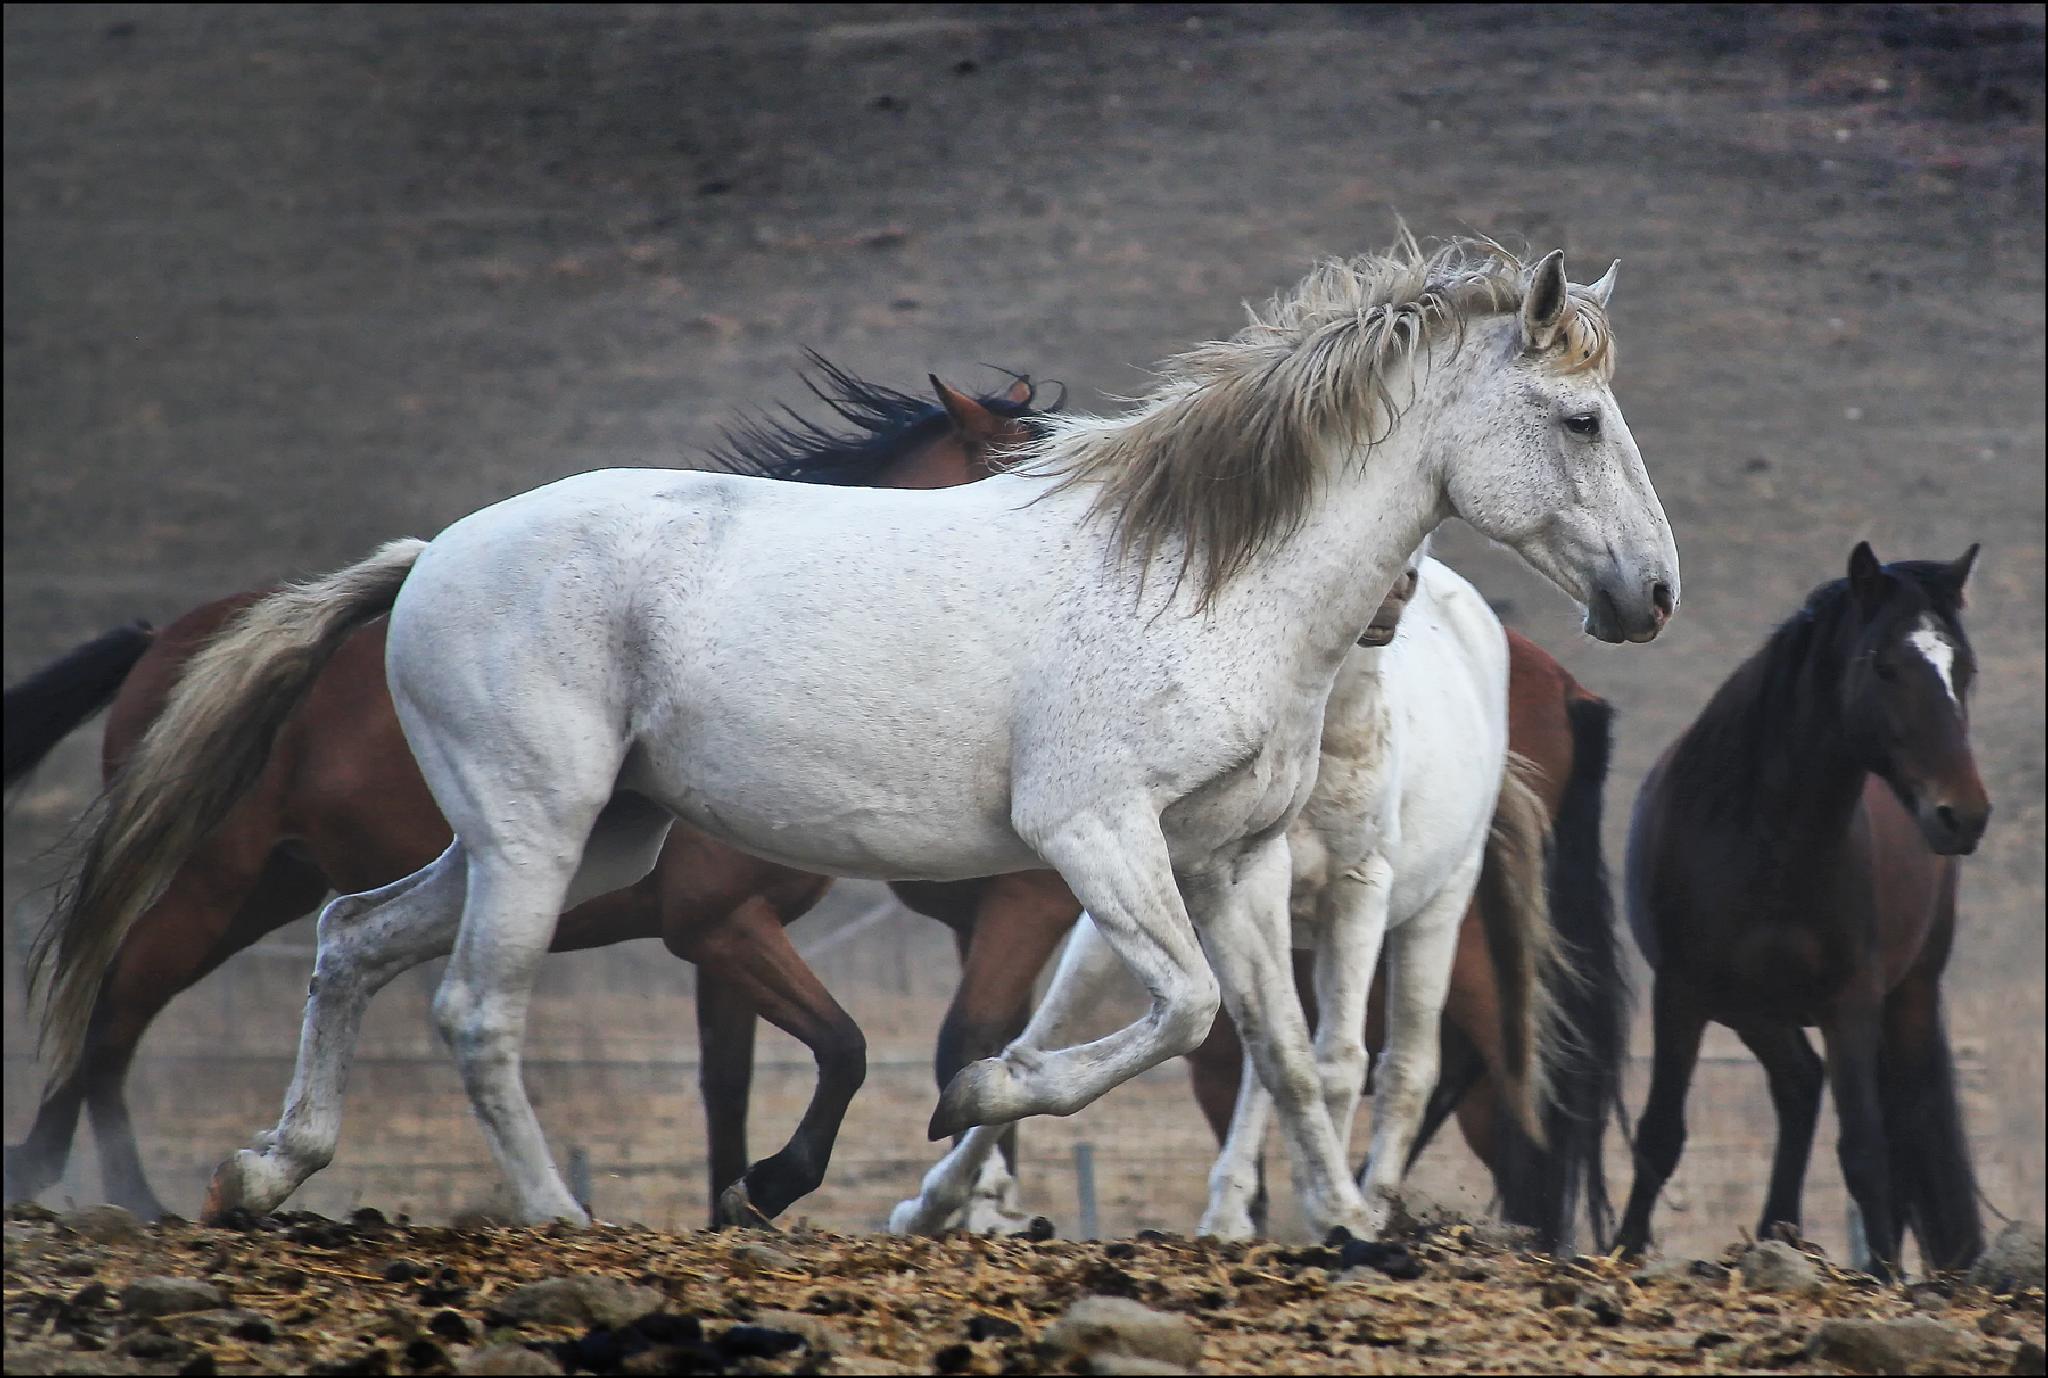 The Herd by Linda Ruiz